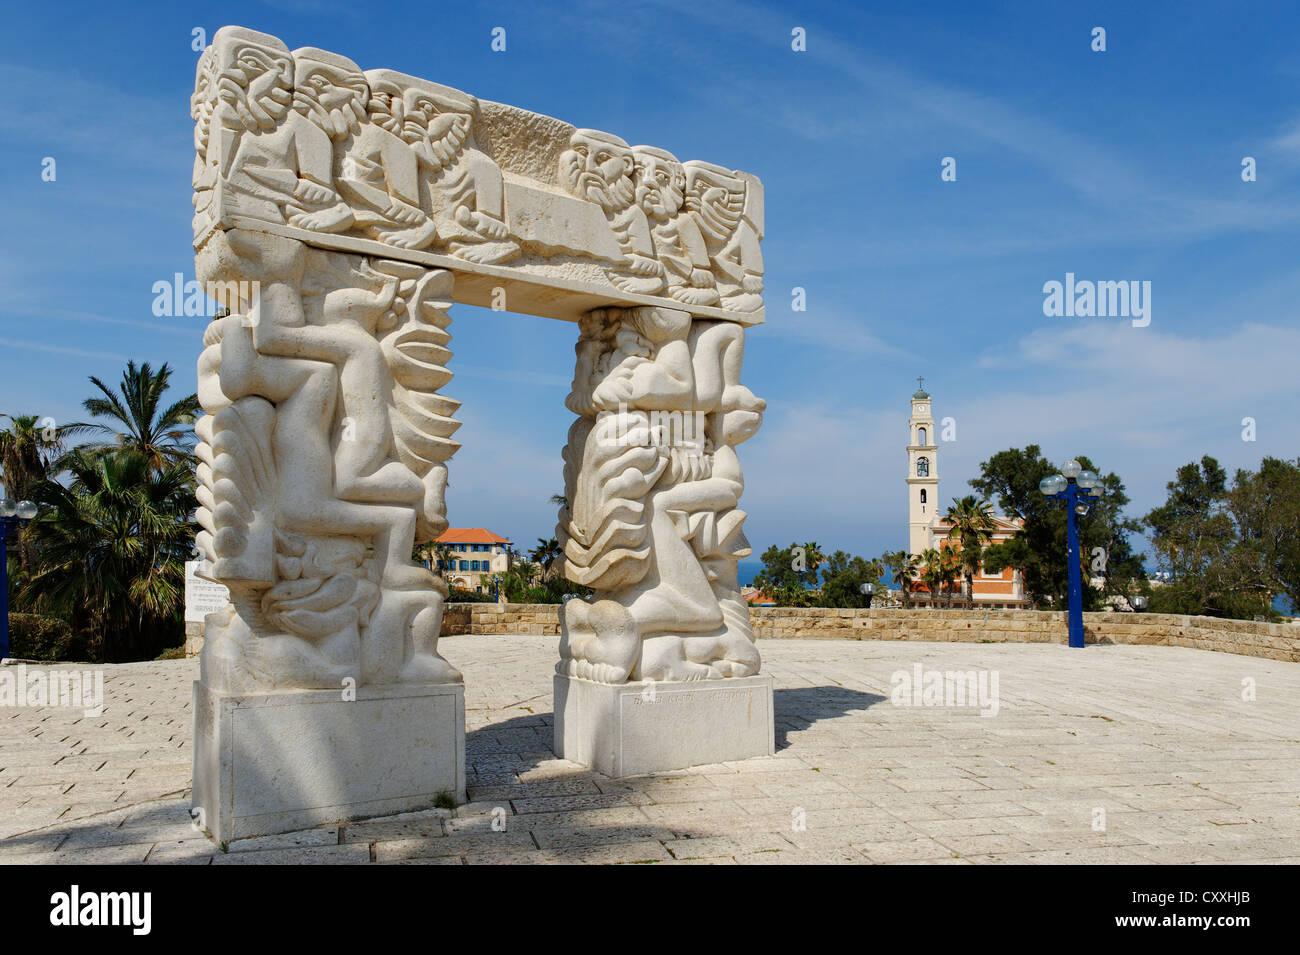 Statue de la foi avec l'Eglise Saint-Pierre, Jaffa, Tel Aviv, Israël, Moyen Orient Photo Stock